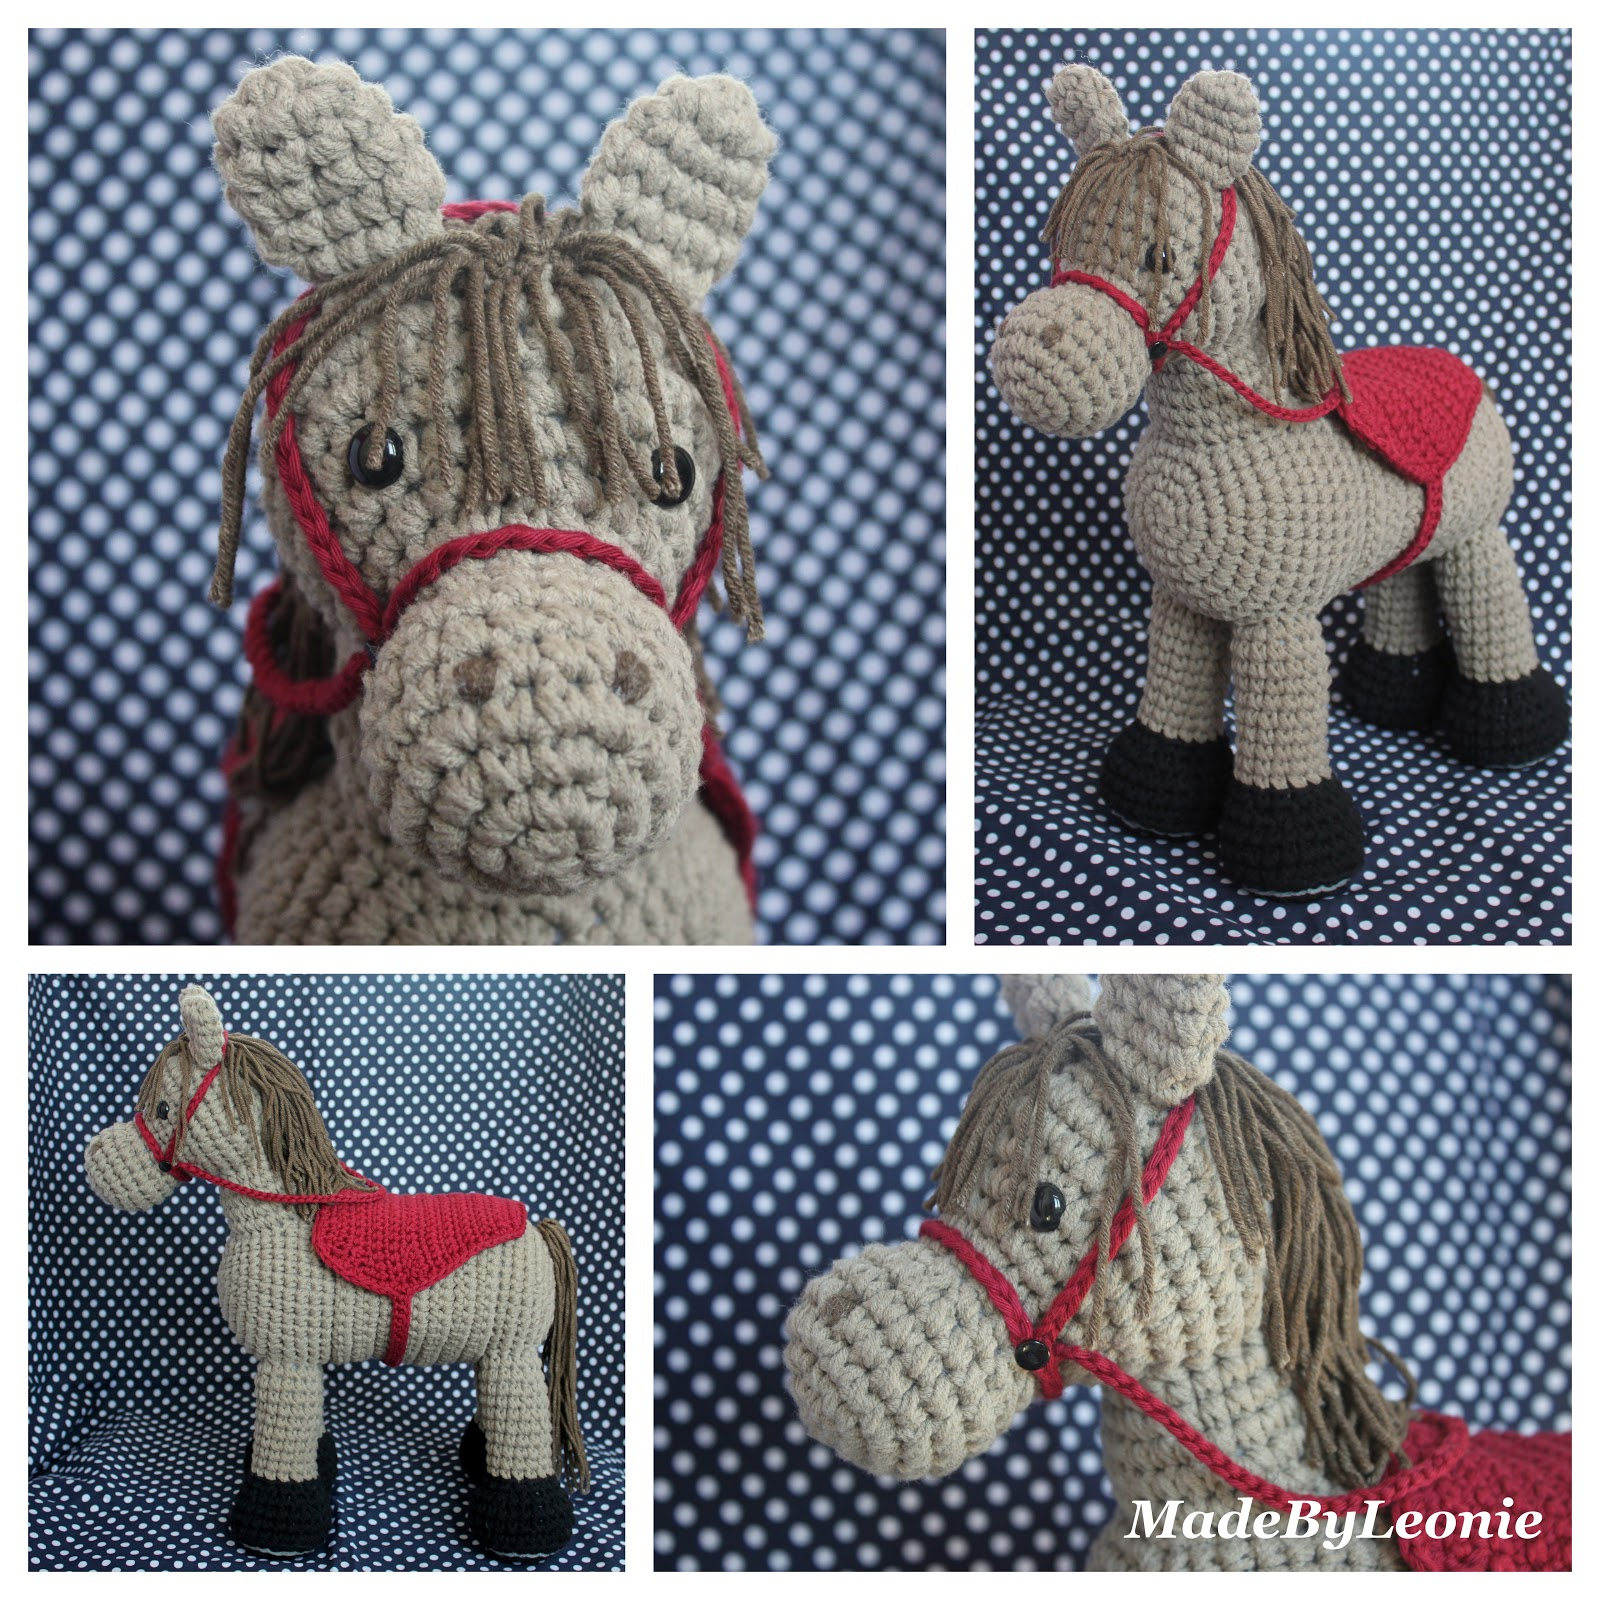 Free Crochet Pattern For Horse : MadeByLeonie: Paard - Knuffel